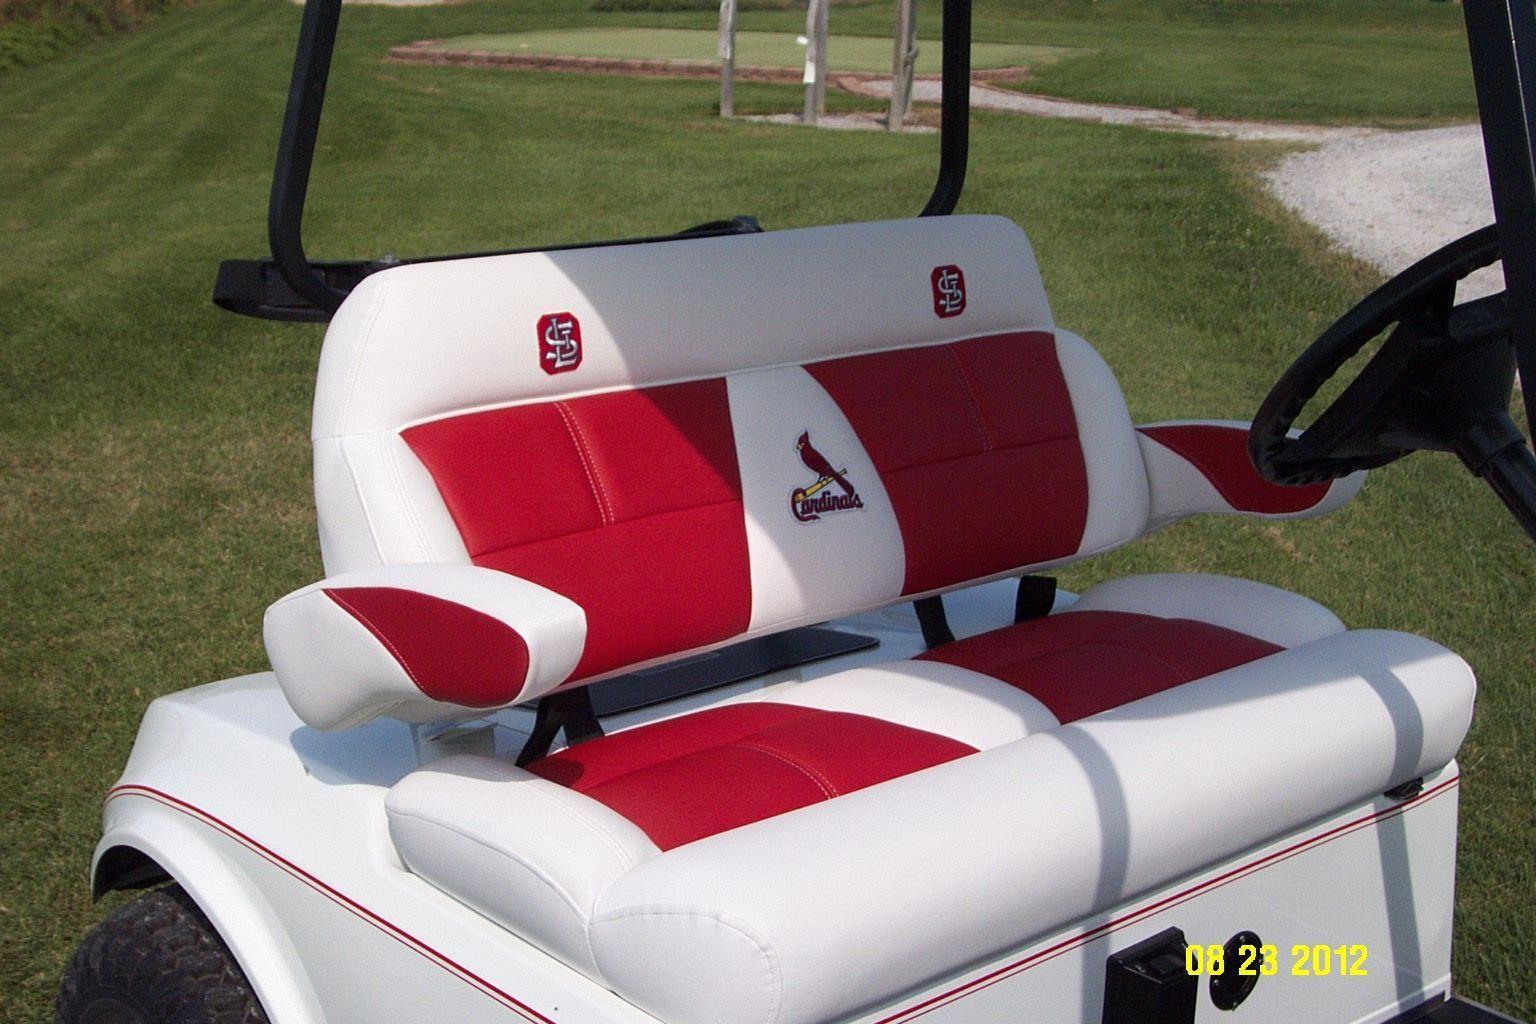 Closeup of Luxury Seat w/St. Louis Cardinals logo